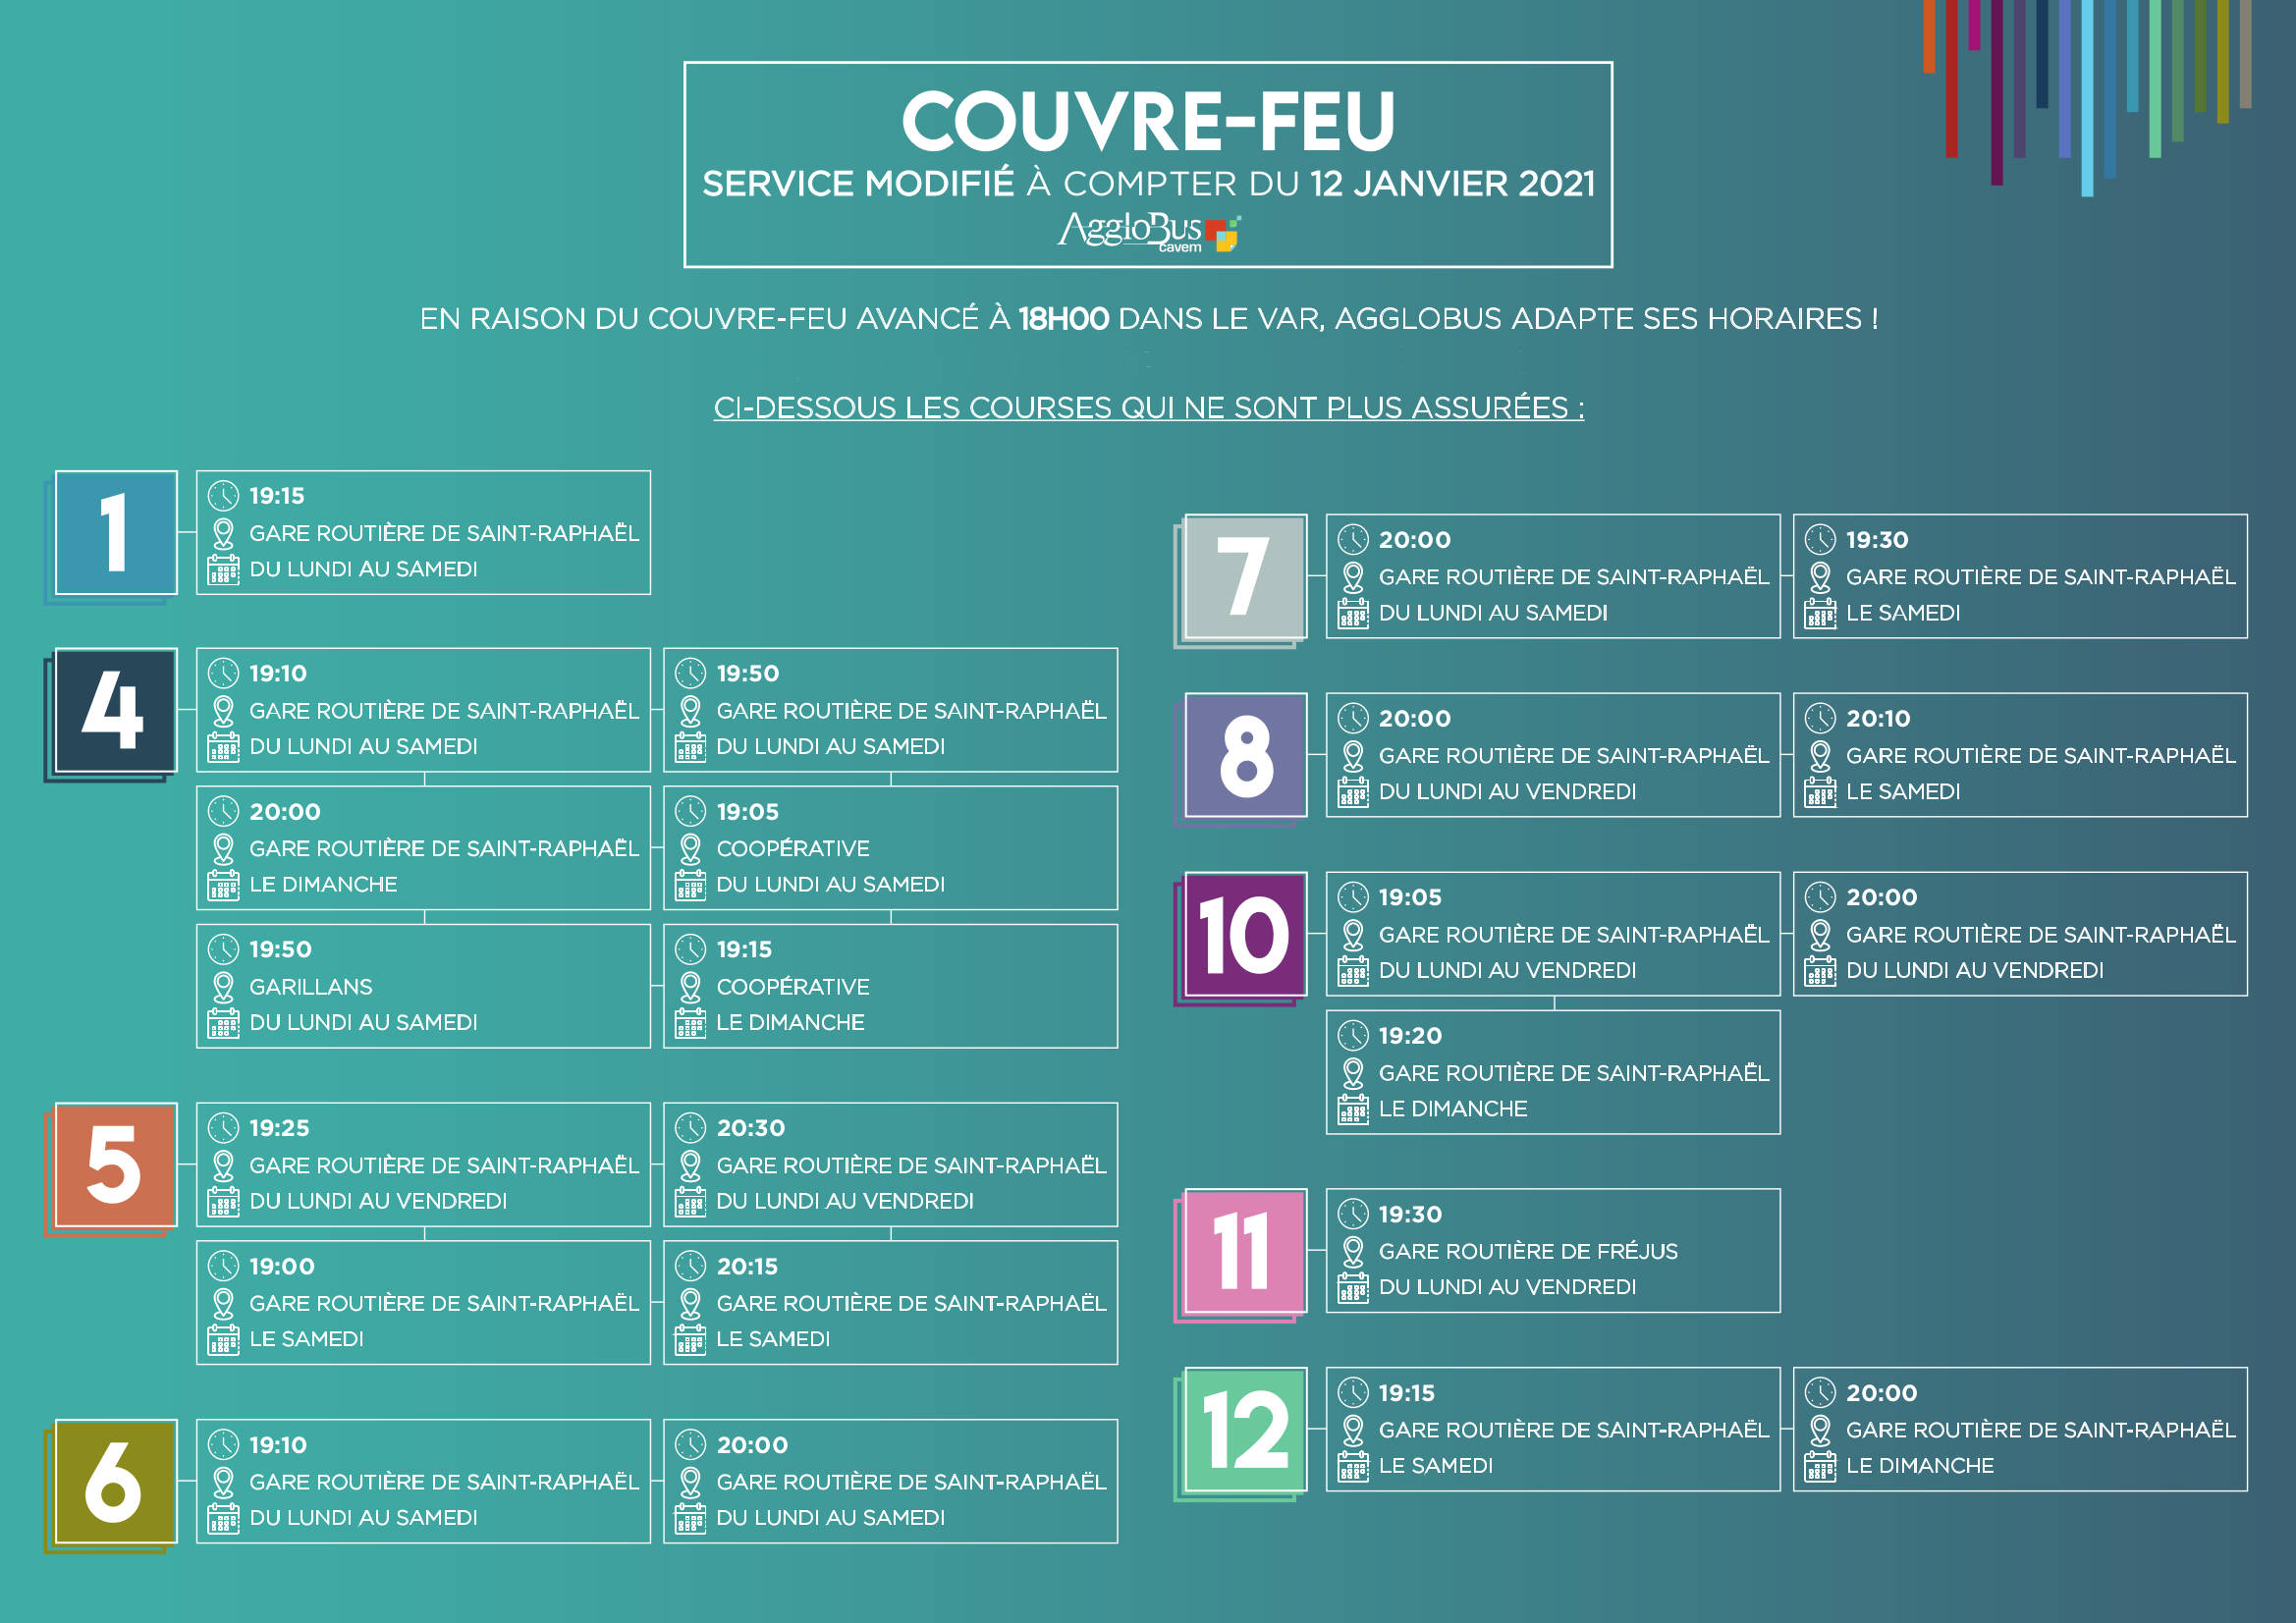 Couvrefeu-Agglobus-v2.jpg